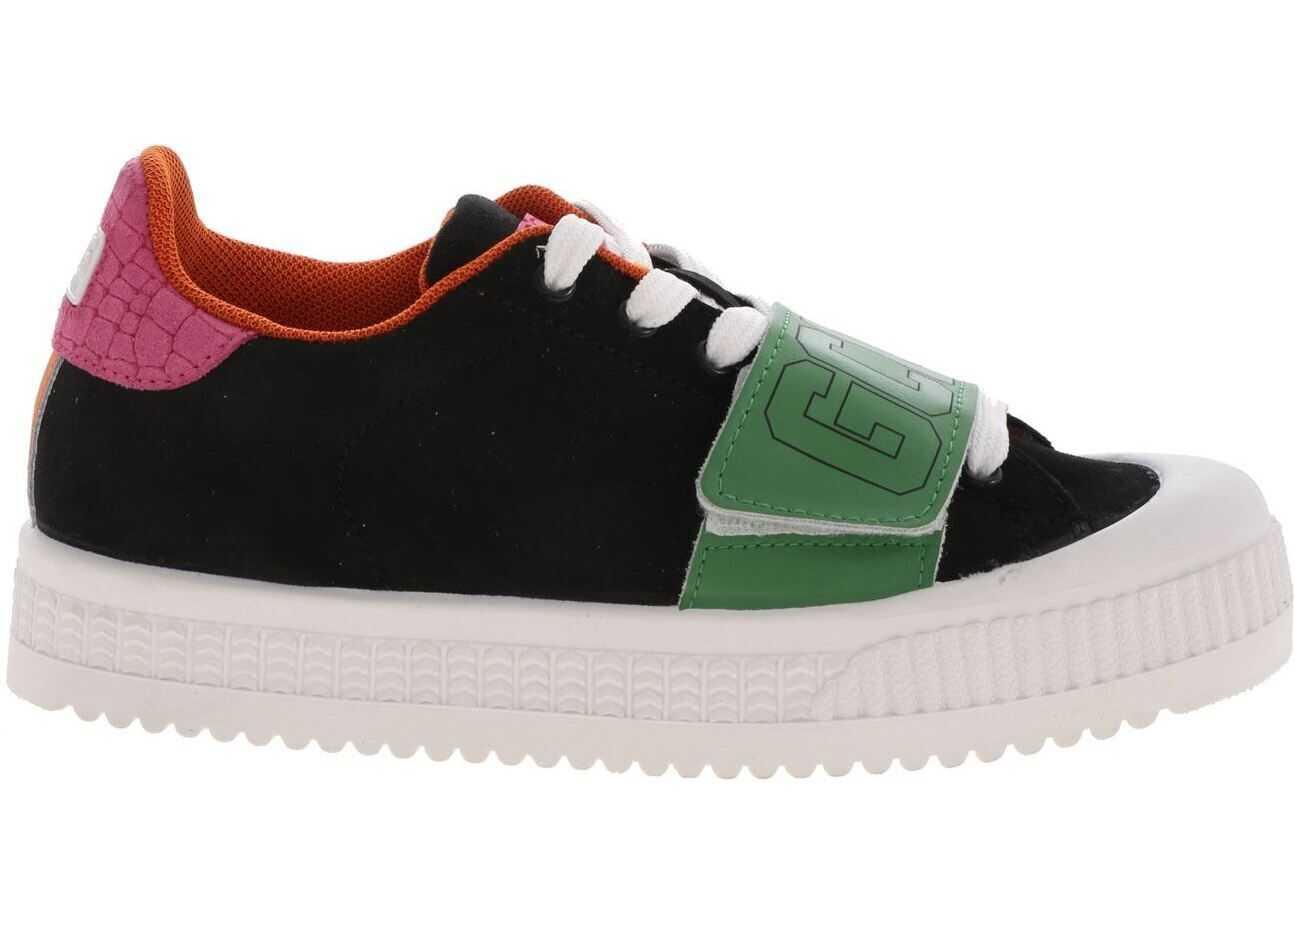 GCDS Classic Sneakers In Black Black